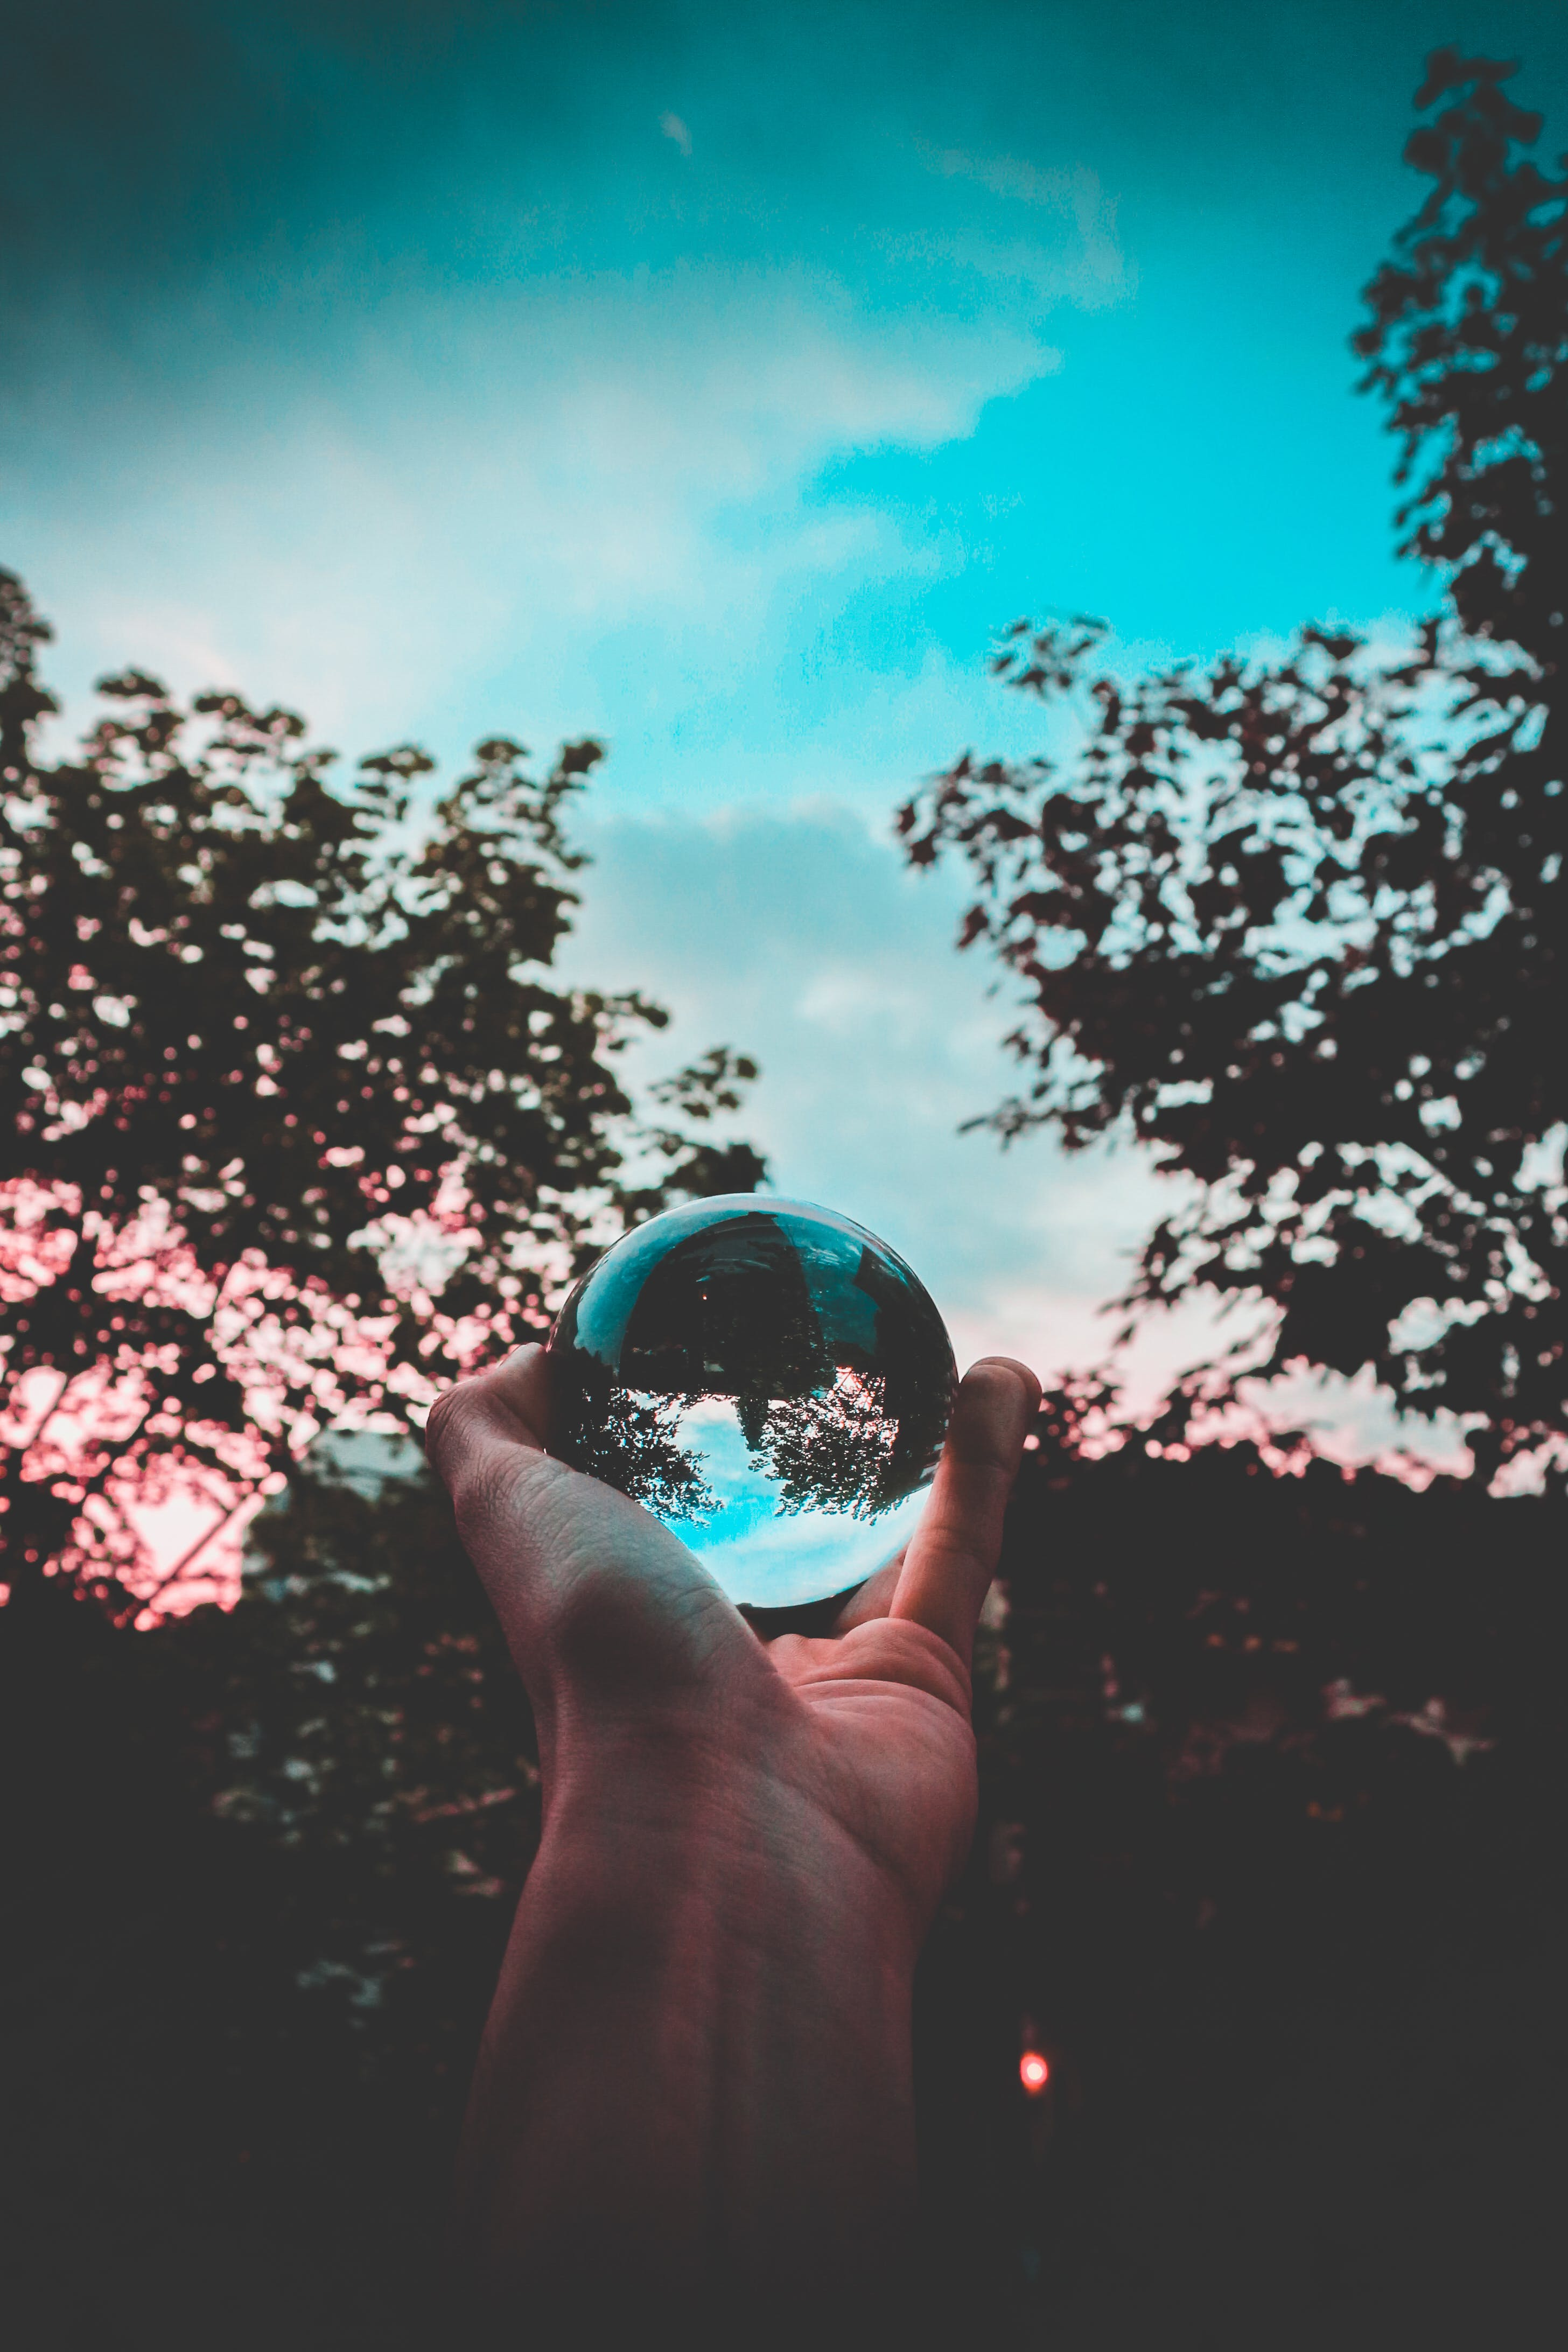 Free stock photo of light, nature, sky, people